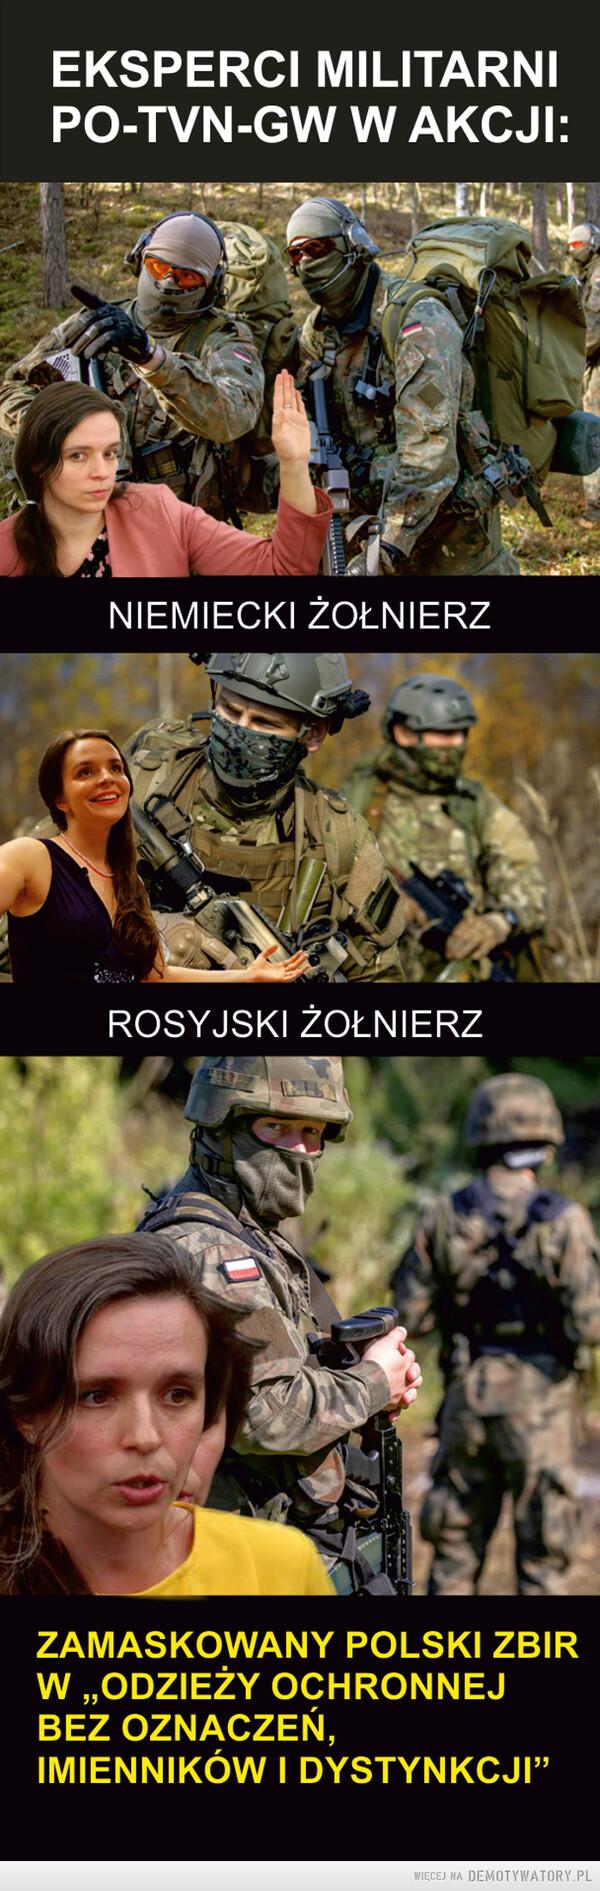 Eksperci wojskowi PO-TVN-GW w akcji – Eksperci wojskowi PO-TVN-GW w akcji